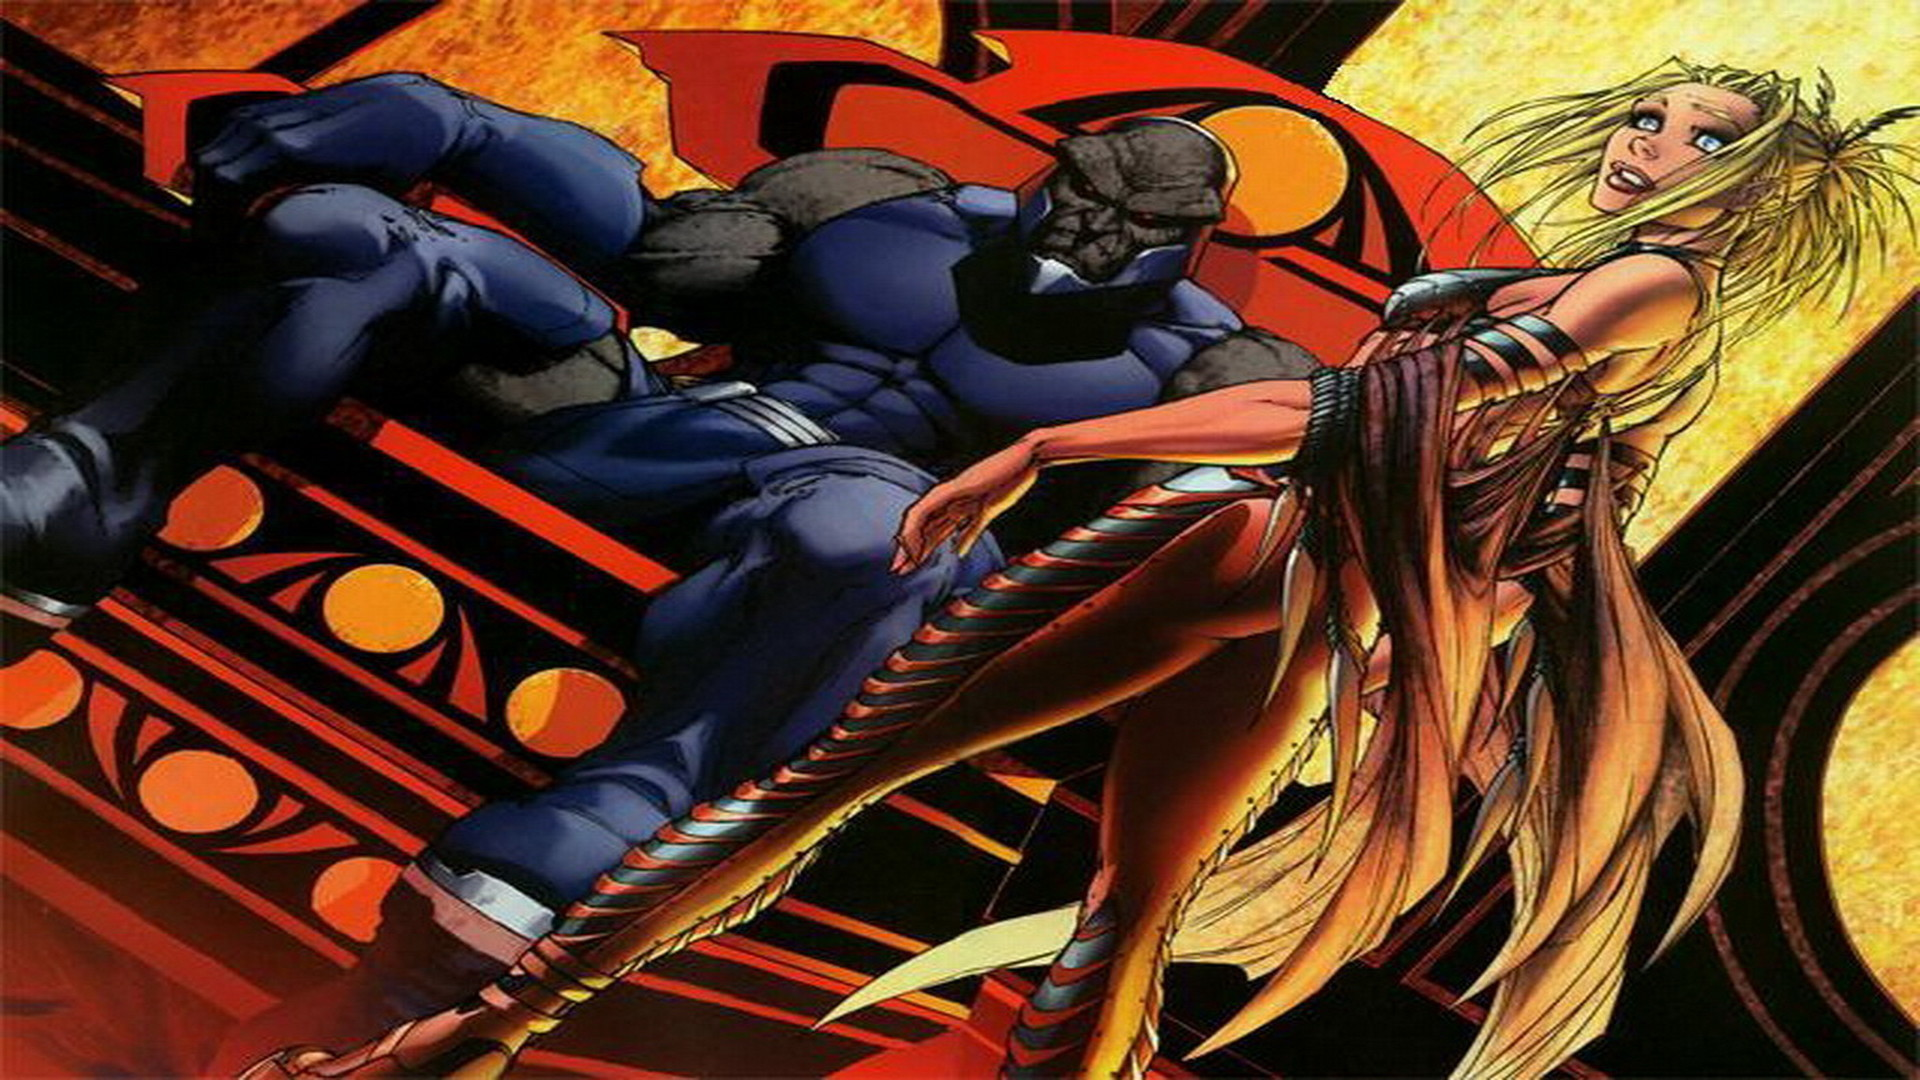 Darkseid-dc-comics-3977536-1024-768, Wallpaper HD, Desktop